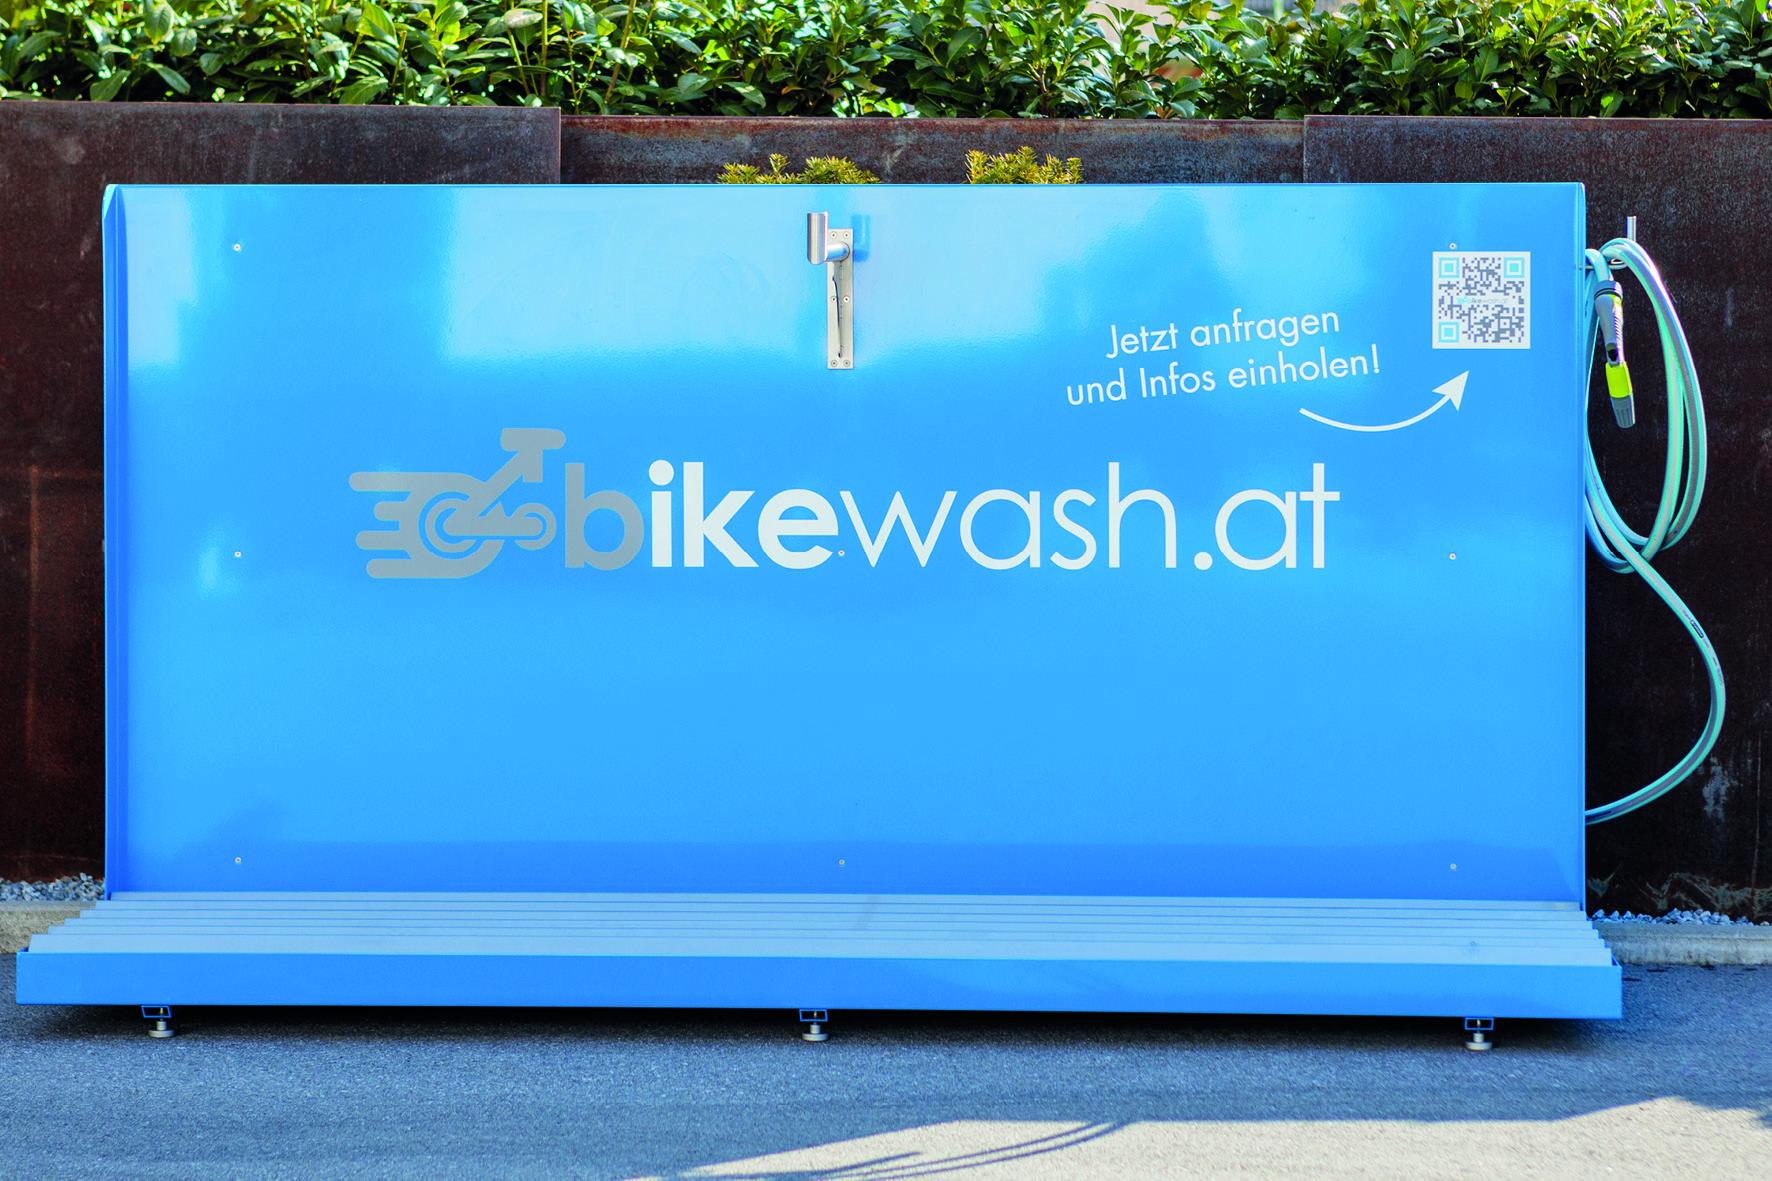 Bikewash_Pressebilder_15x10_cm_2005214.jpg